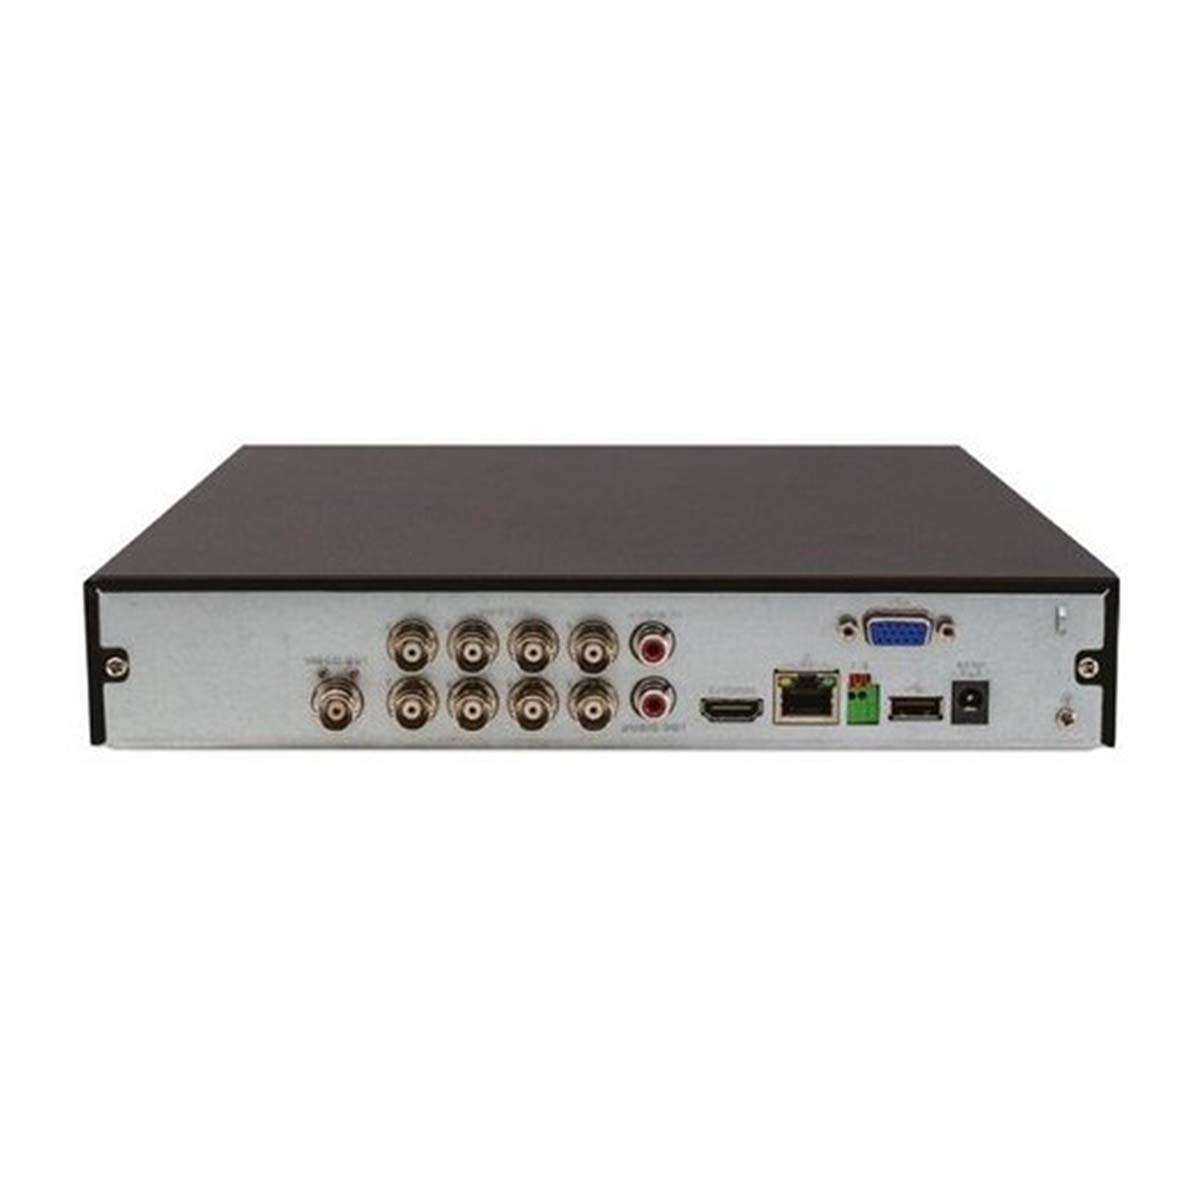 STAND ALONE INTELBRAS DVR 08 CANAIS MHDX 3108 C/HD 2TB